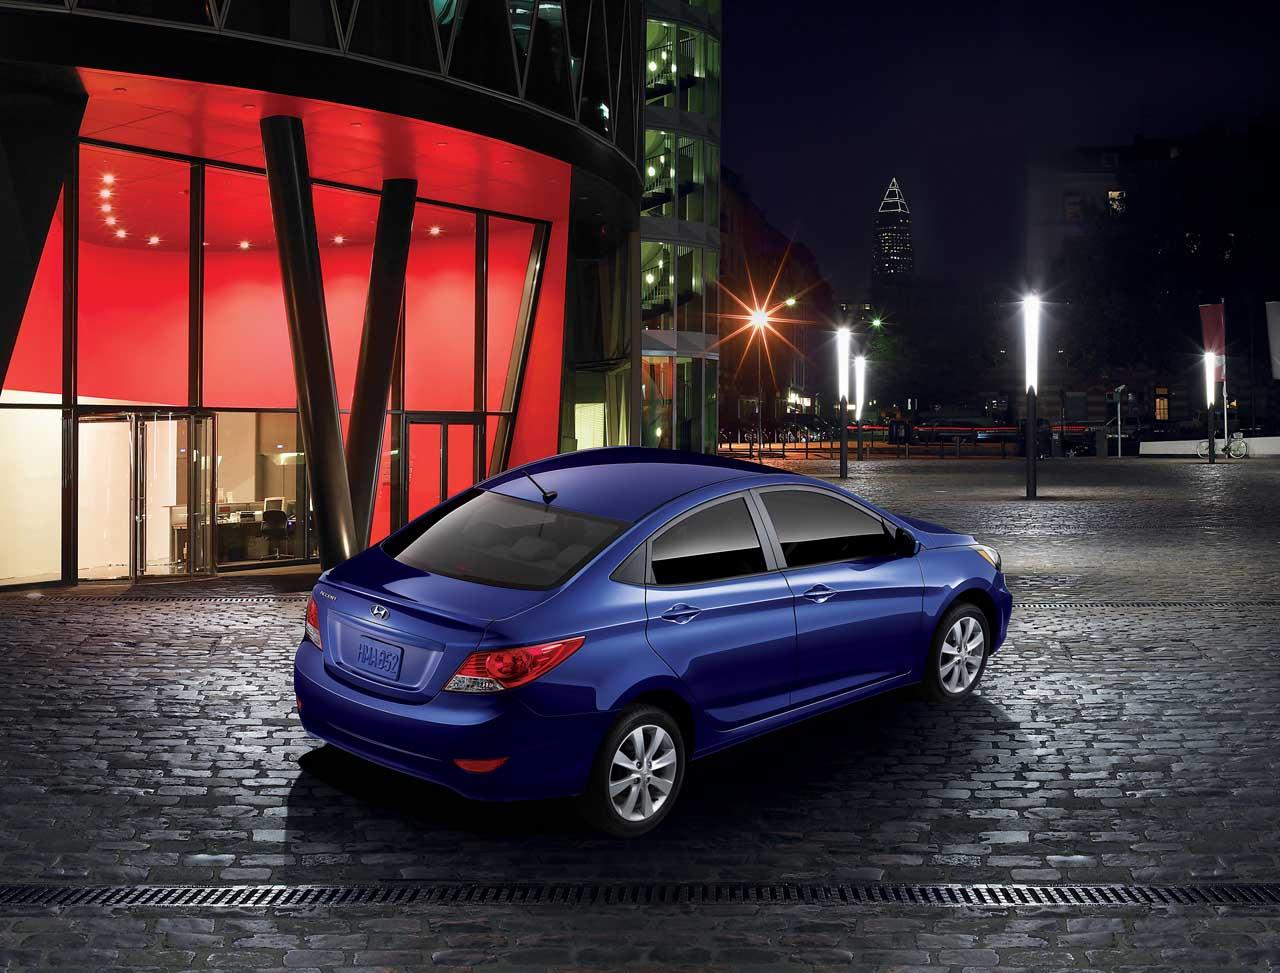 2013 Hyundai Accent Rear Angle (Photo 14 of 18)